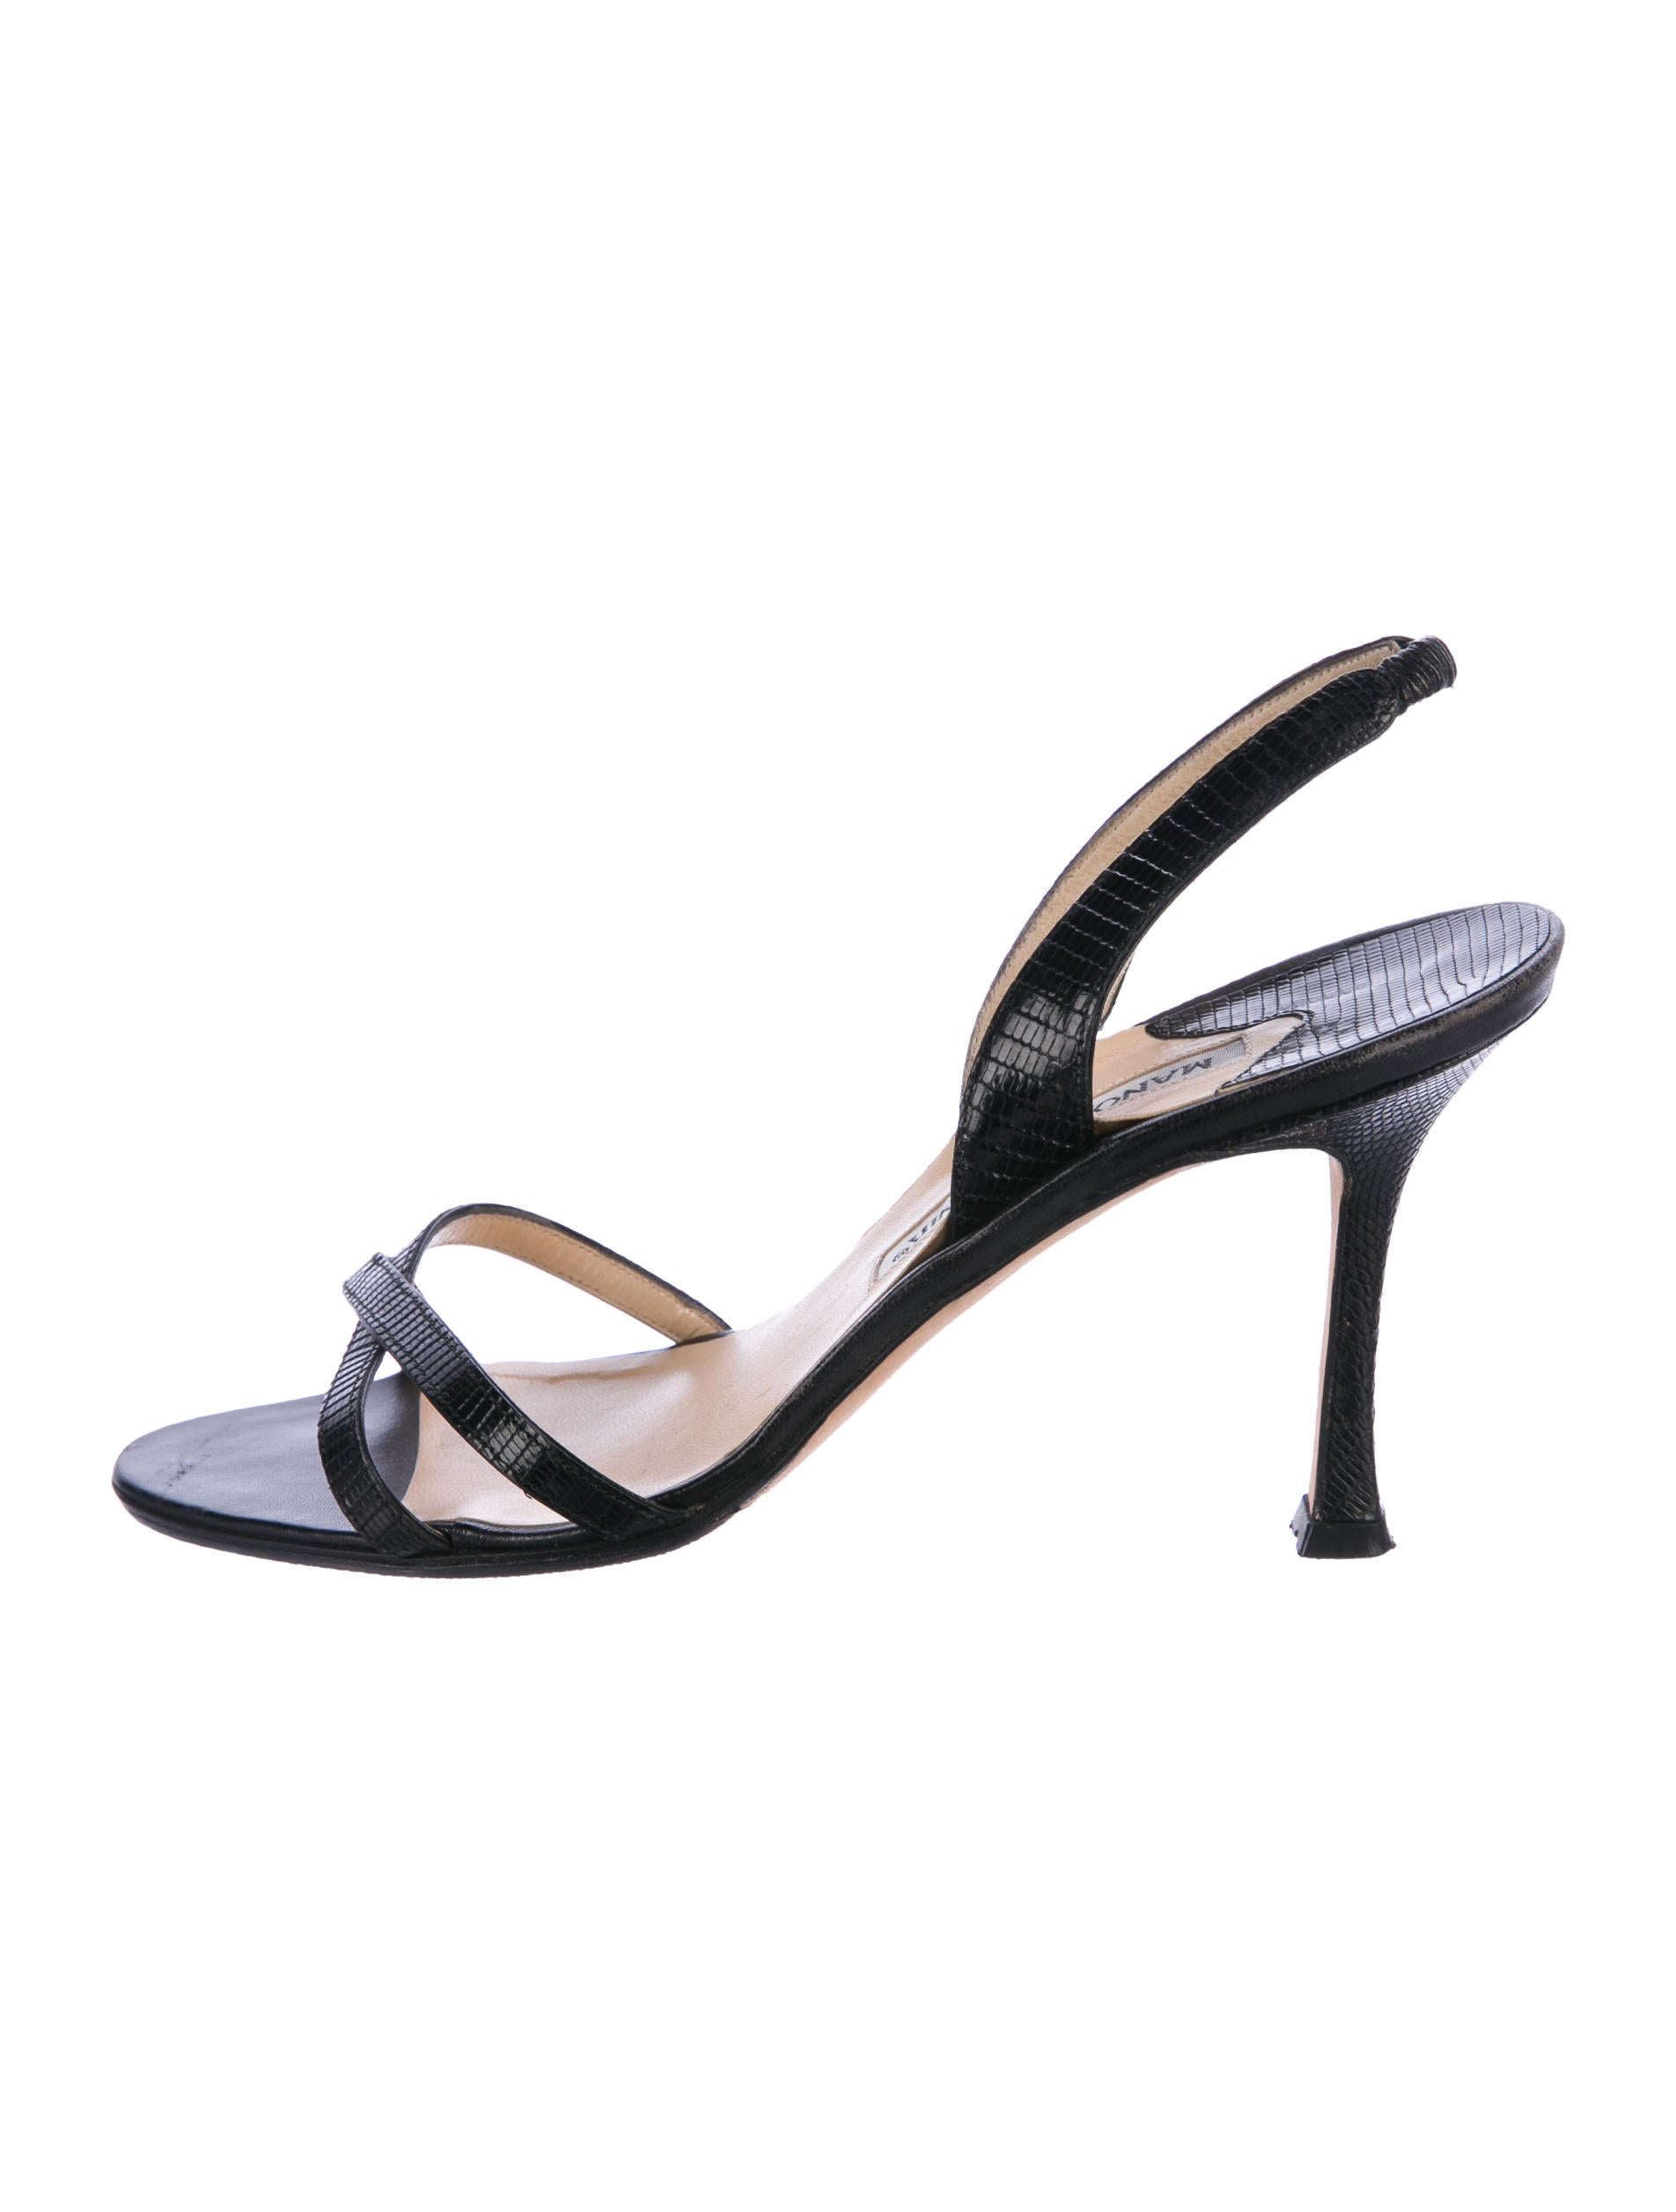 Manolo Blahnik Lizard Slingback Sandals clearance really cheap sneakernews cheap sast clearance 2014 unisex G9sqa0kK